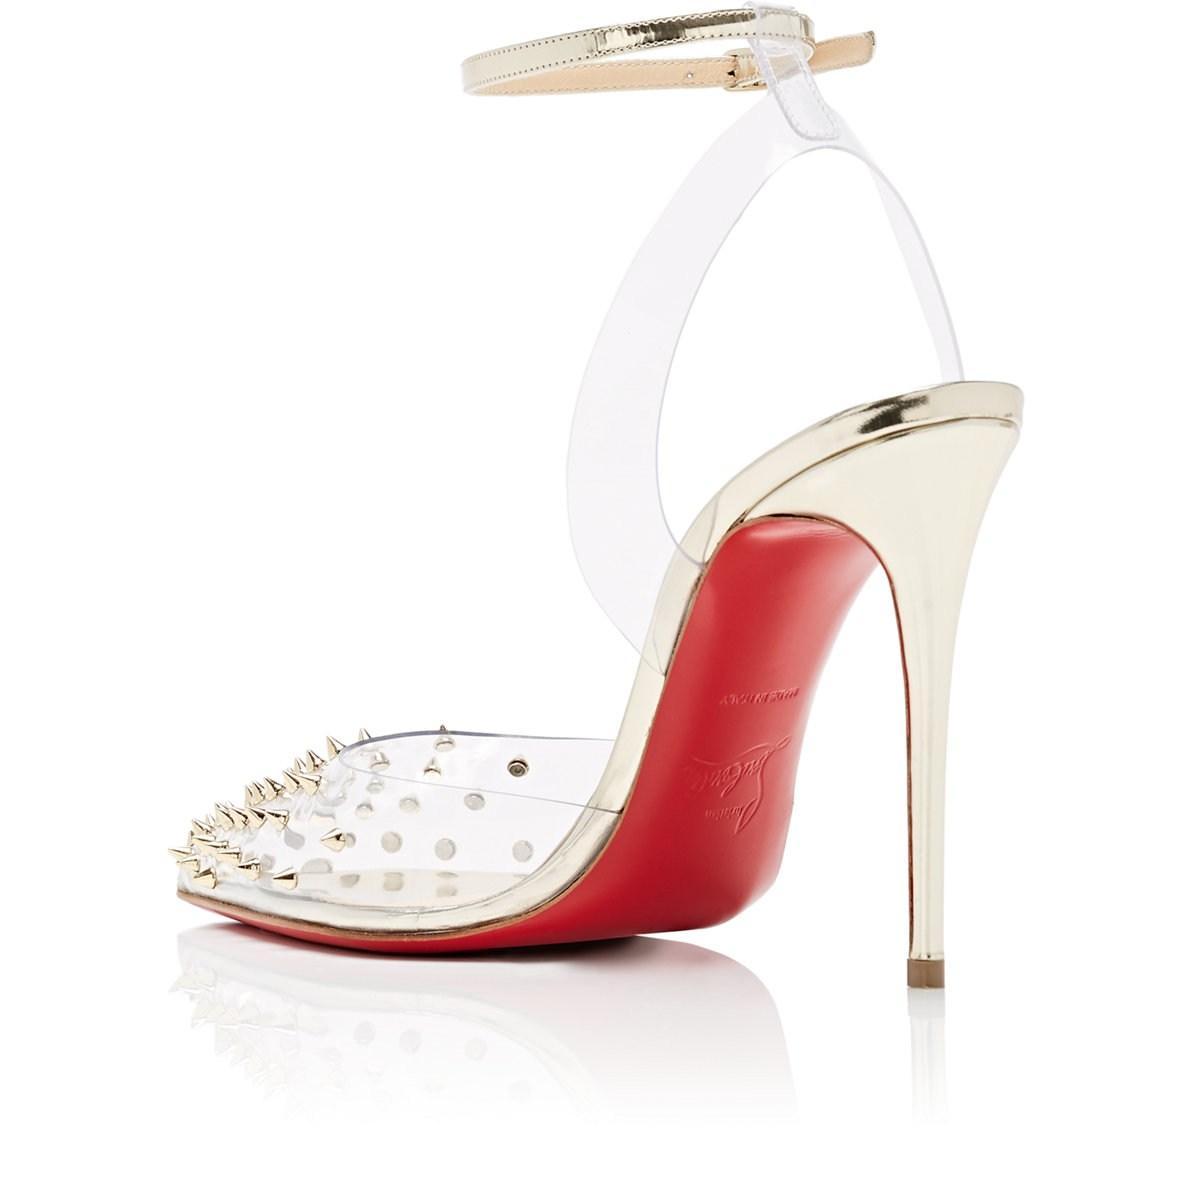 755b3d45e6b Christian Louboutin - White Spikoo Pvc   Leather Sandals - Lyst. View  fullscreen